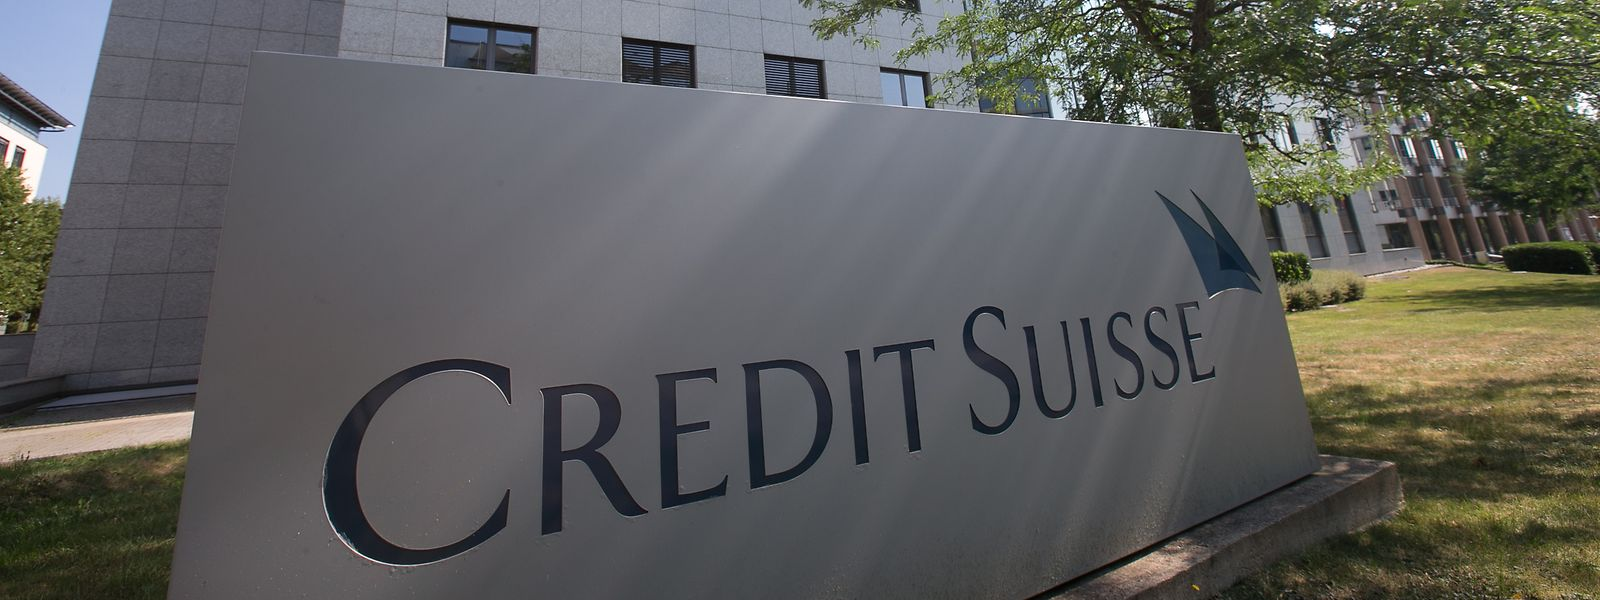 Filial do Credit Suisse, em Kirchberg, na capital luxemburguesa.